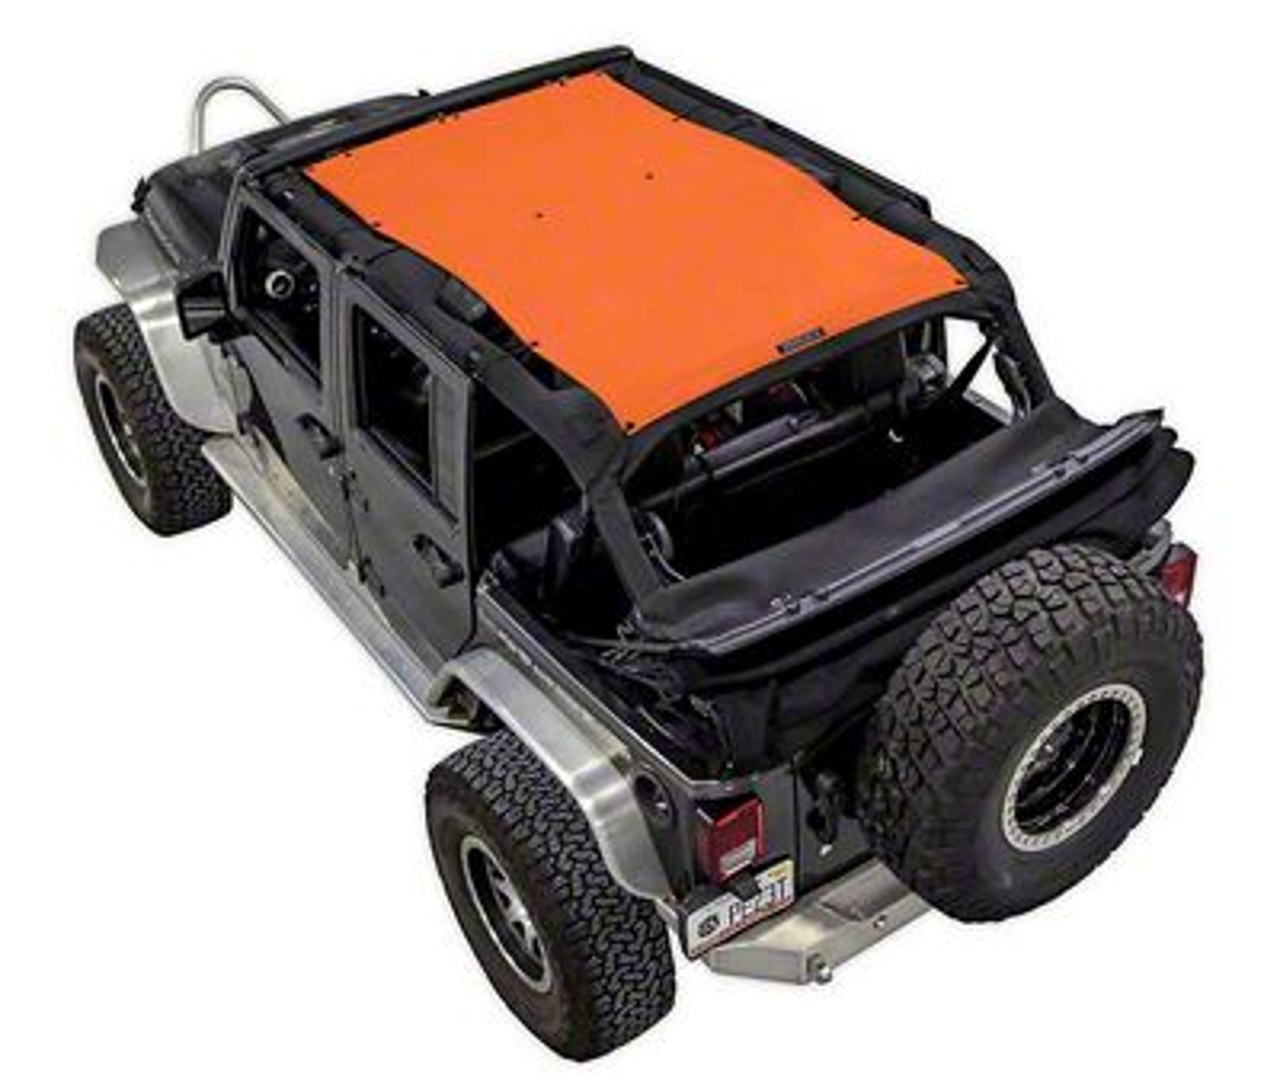 SpiderWeb Shade Trail Mesh ShadeTop - Orange (07-18 Jeep Wrangler JK 4 Door)